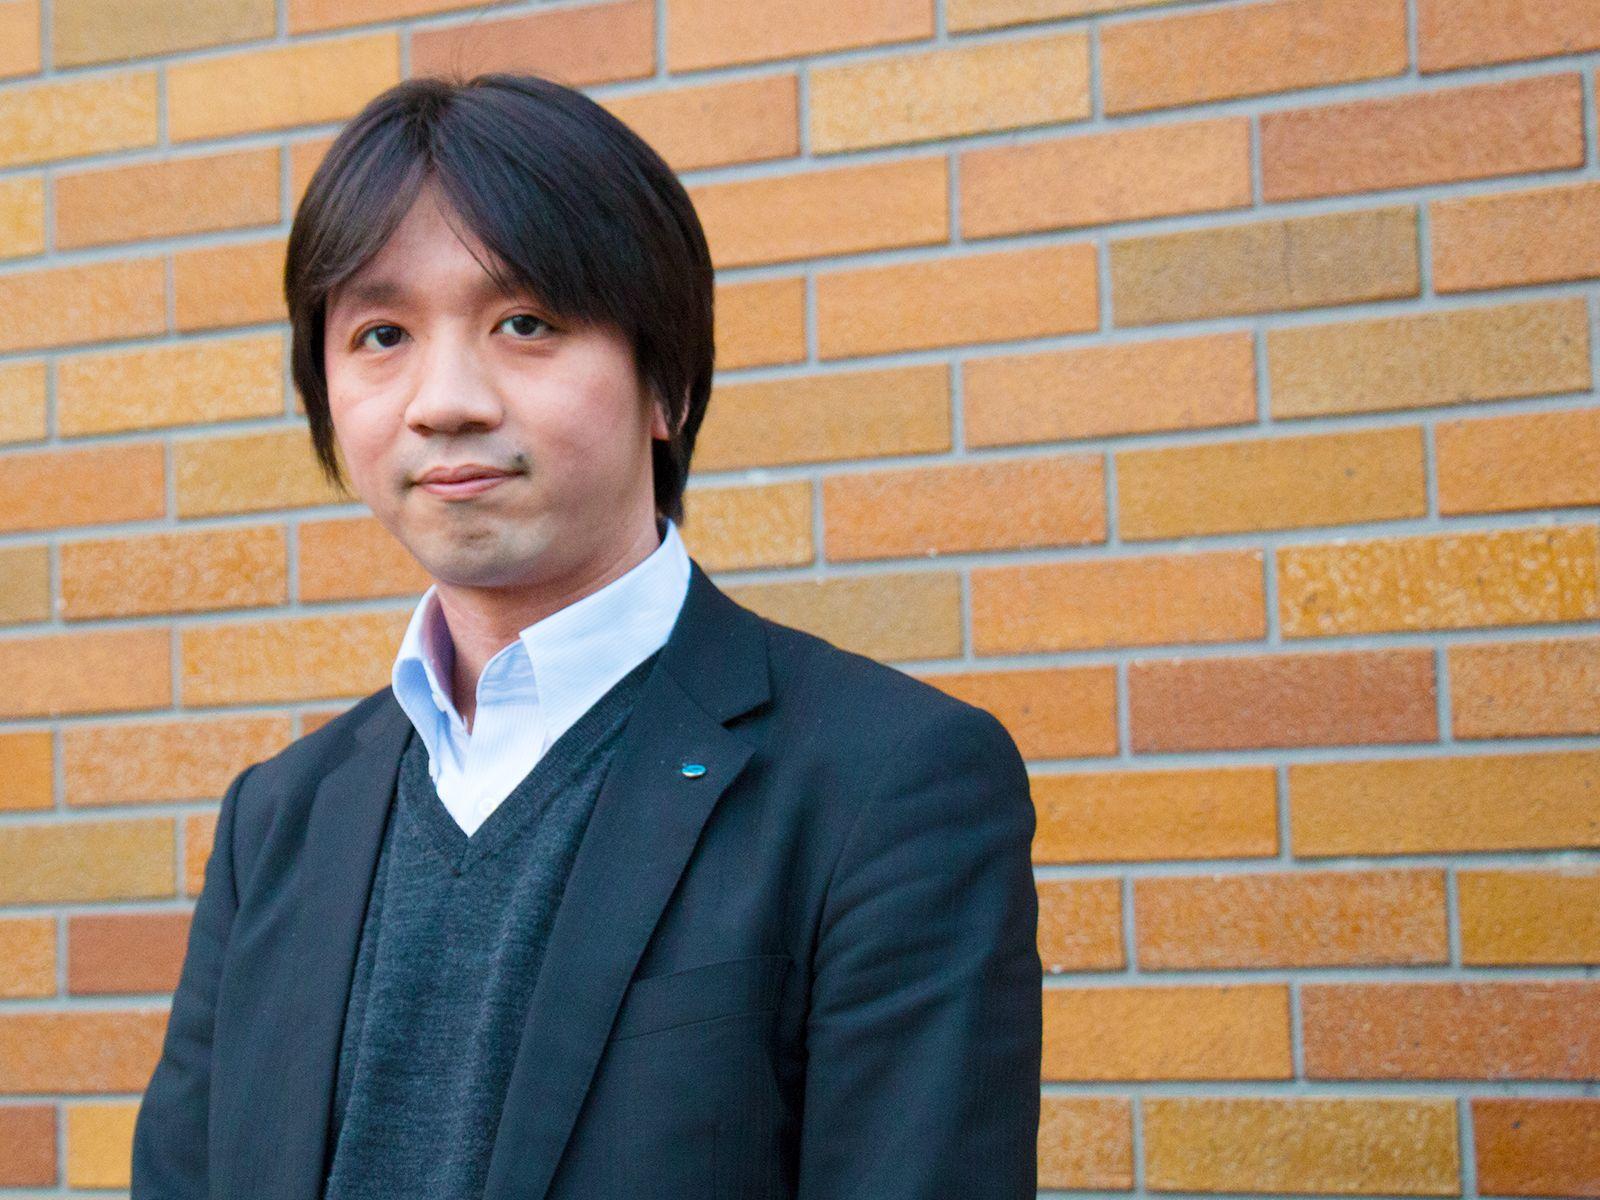 takano_4_3_message